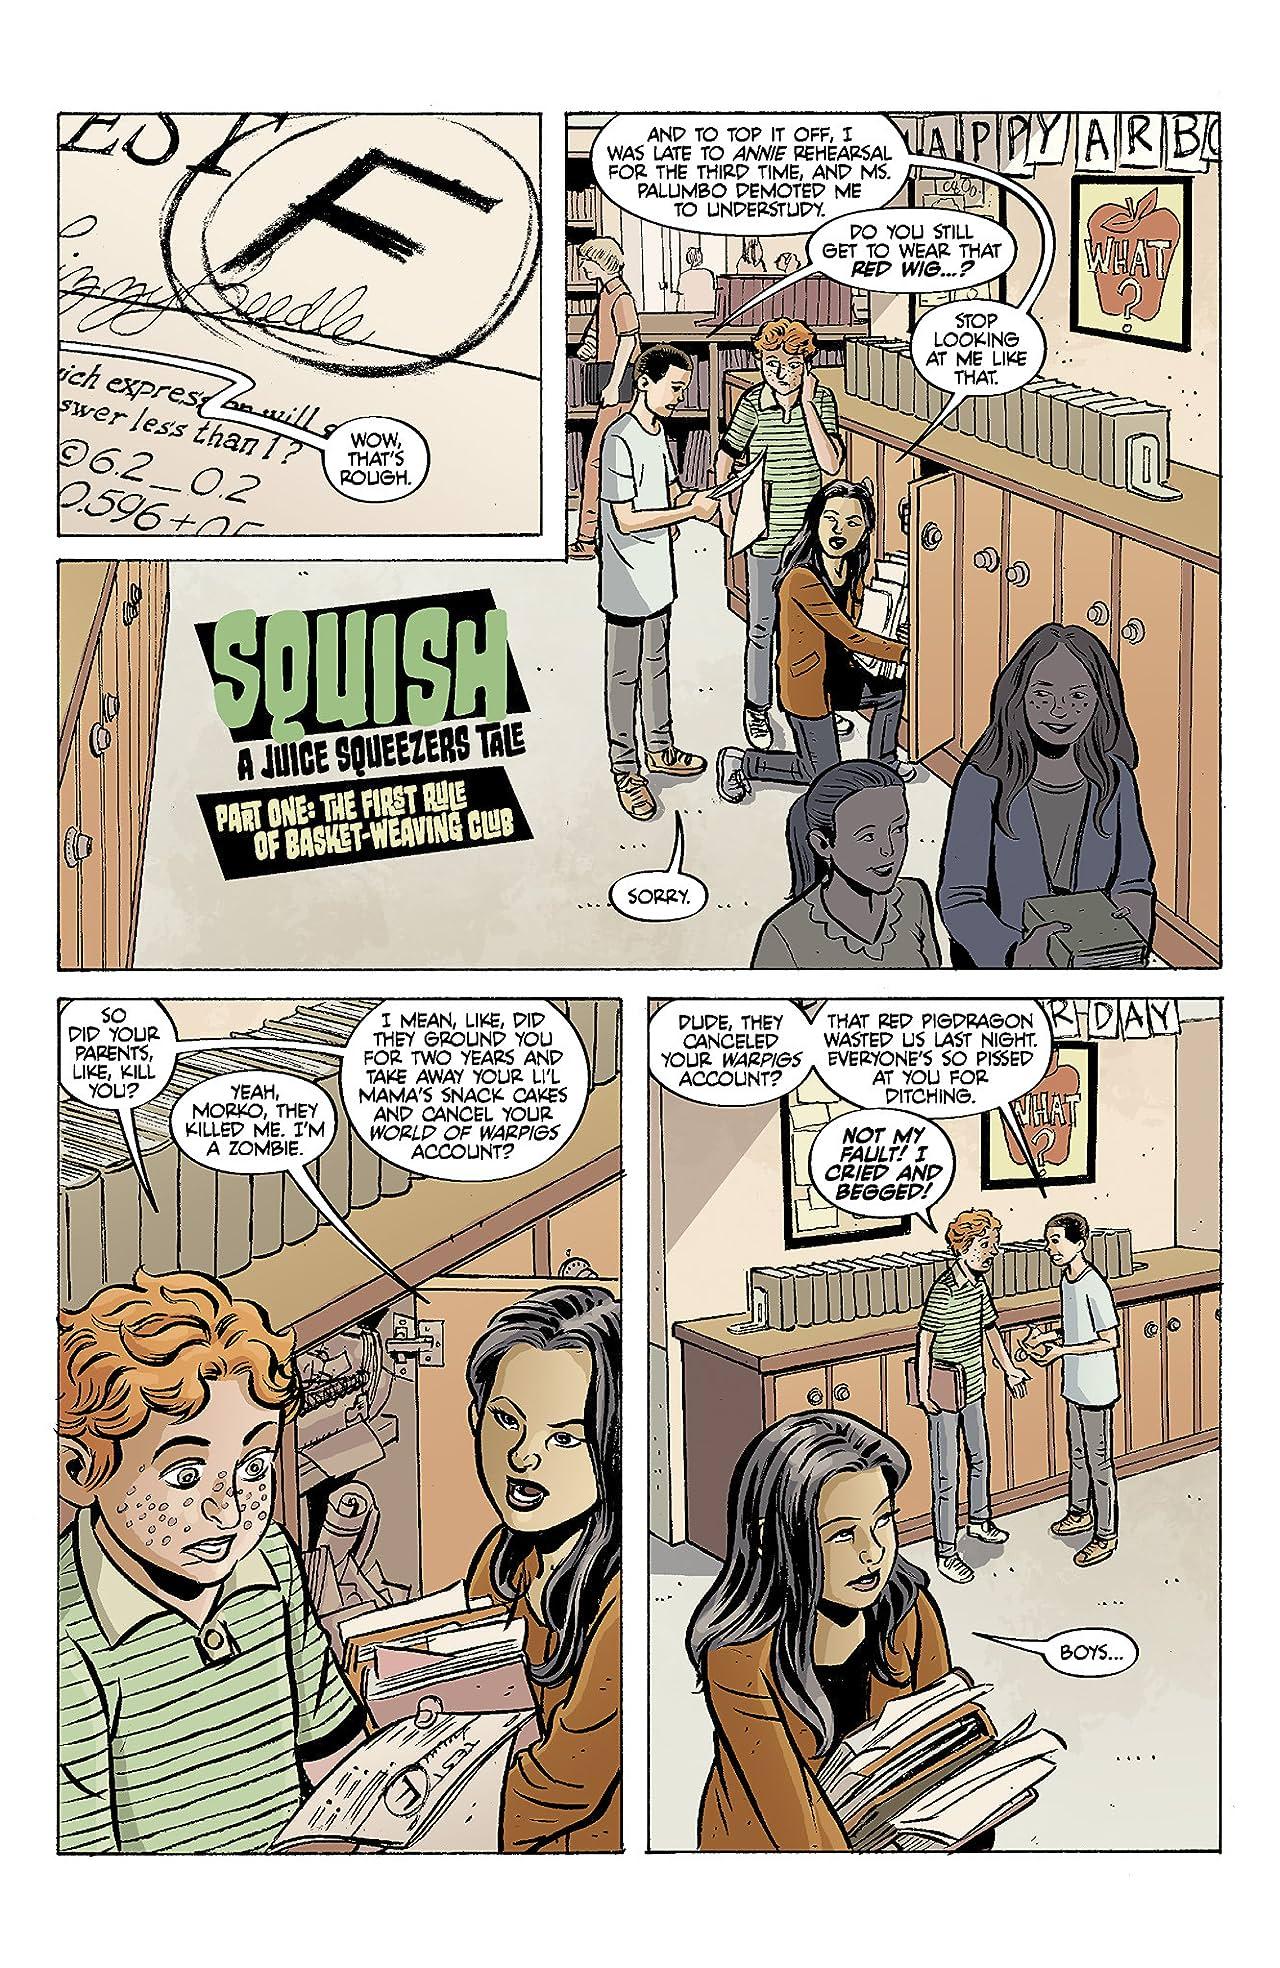 Juice Squeezers: Squish #0